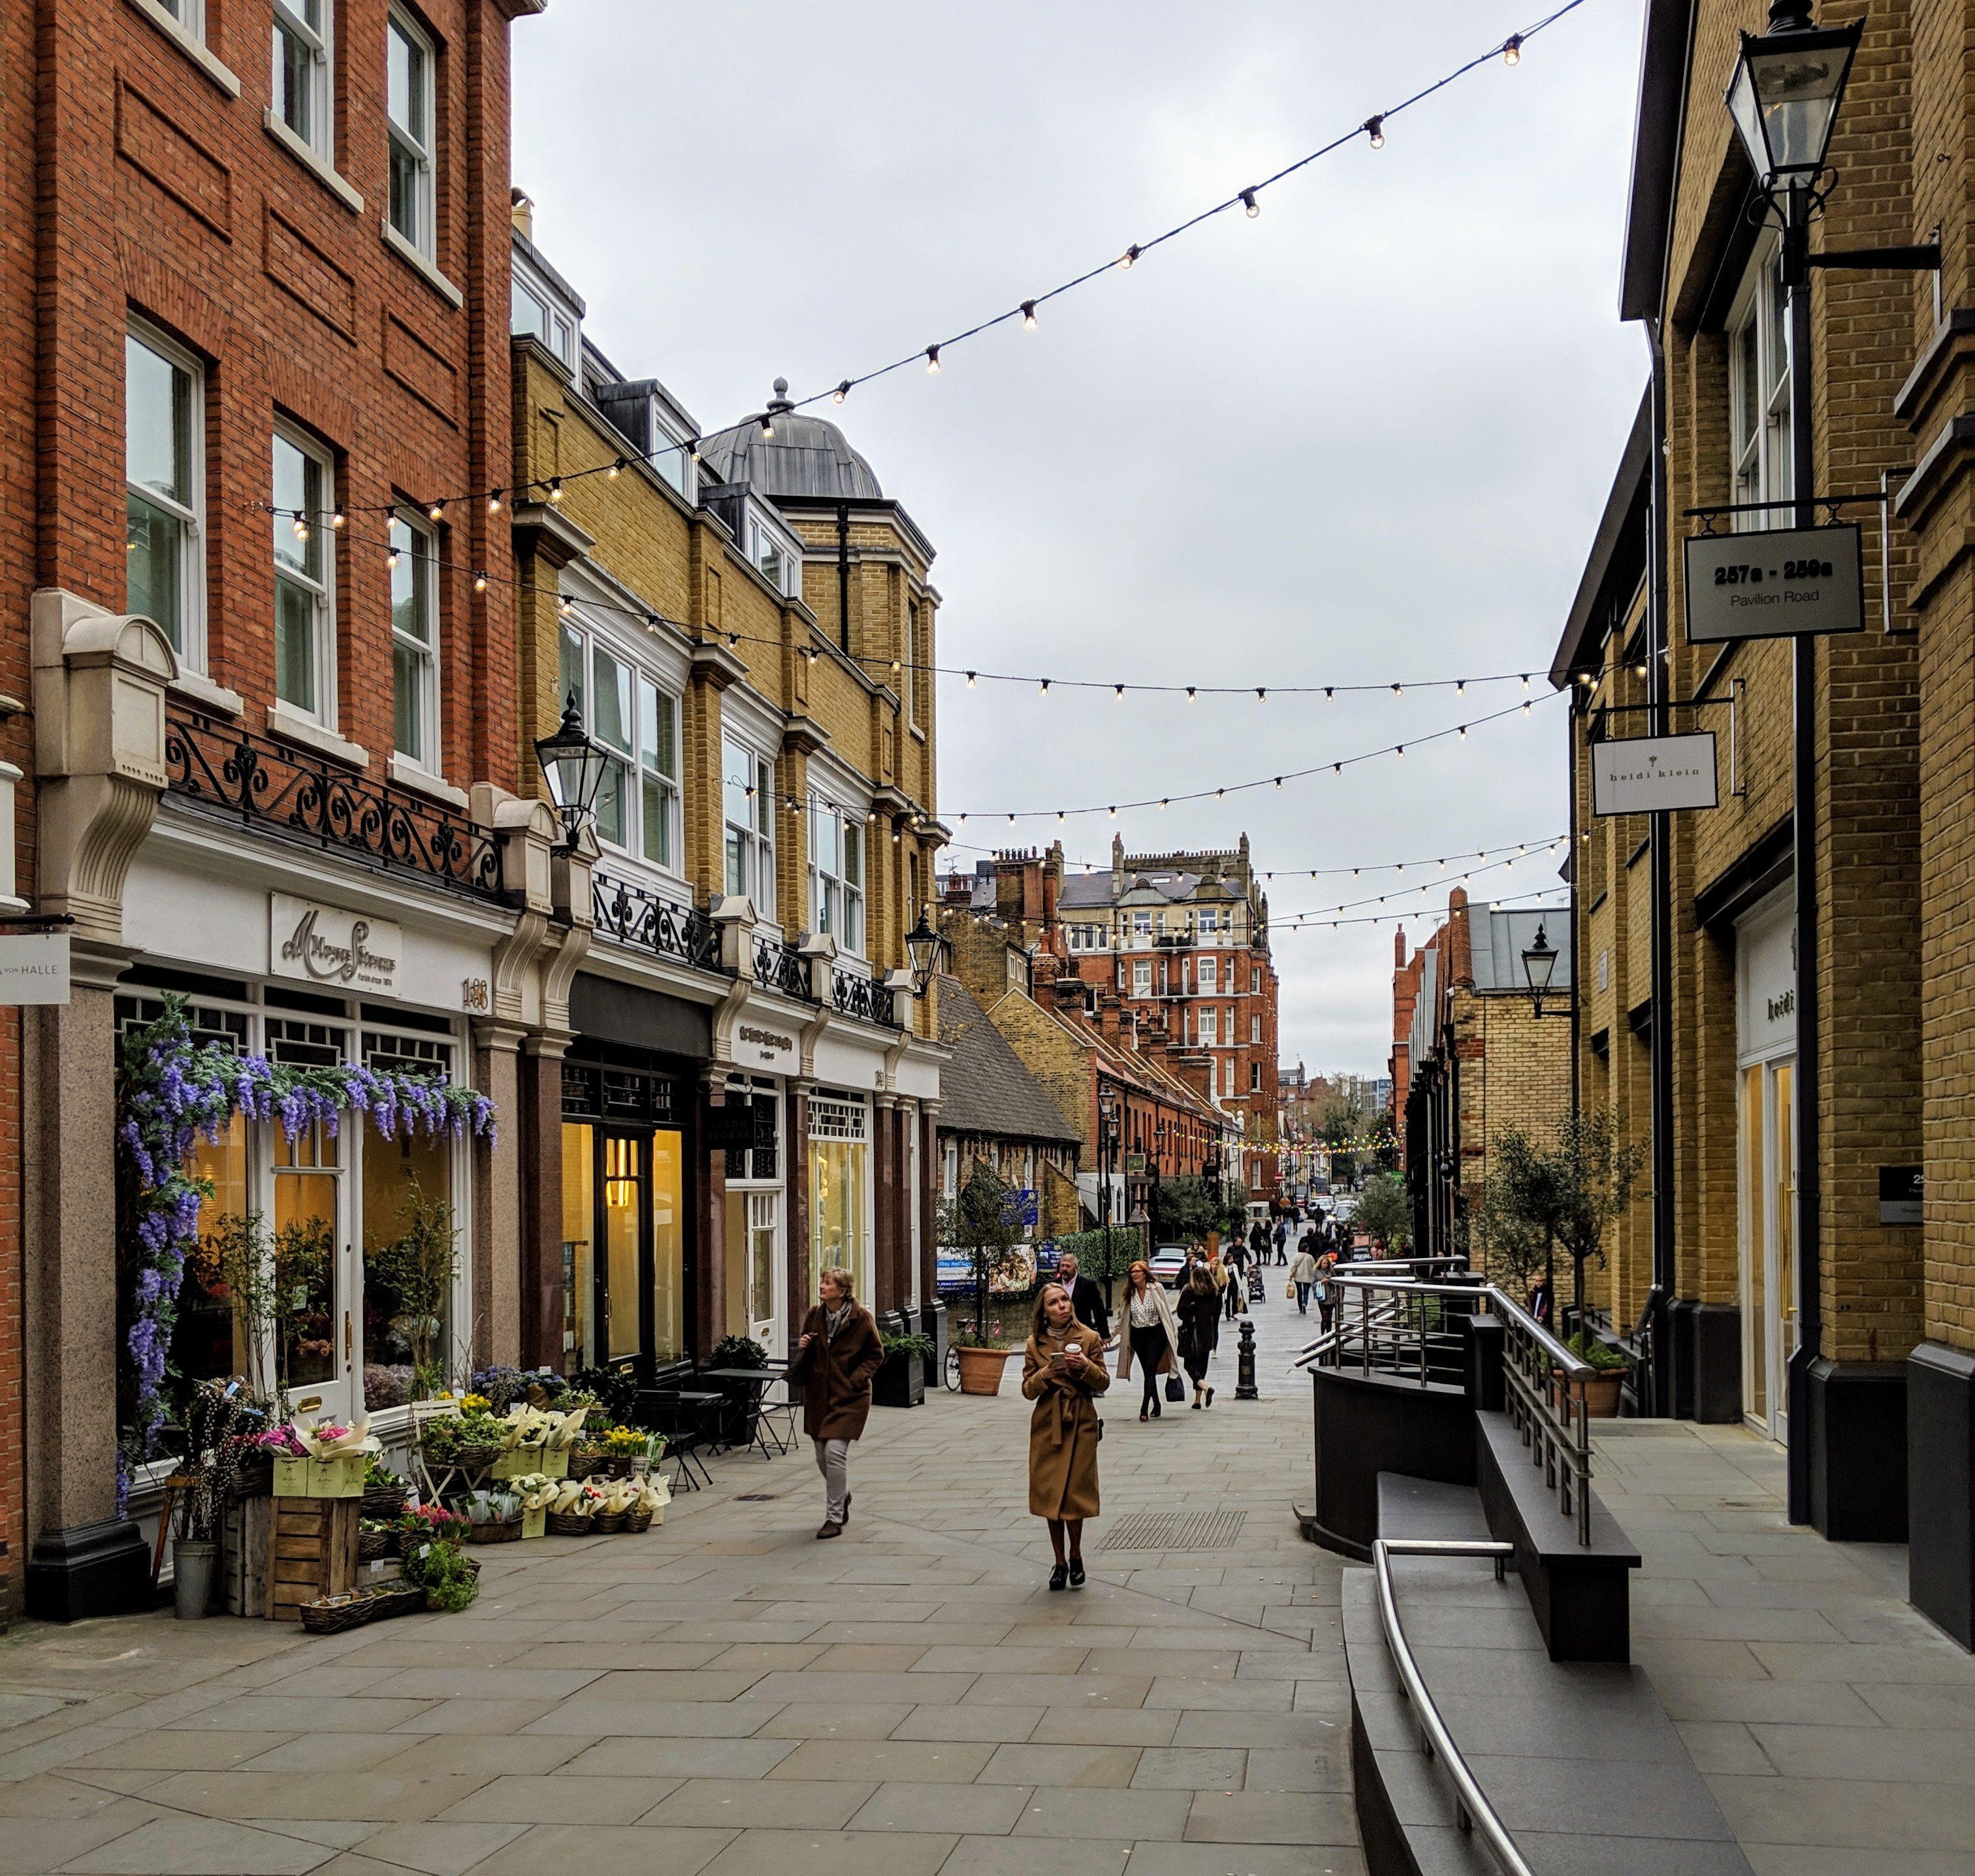 Slone Square ロンドン イギリス チェルシー Chelsea